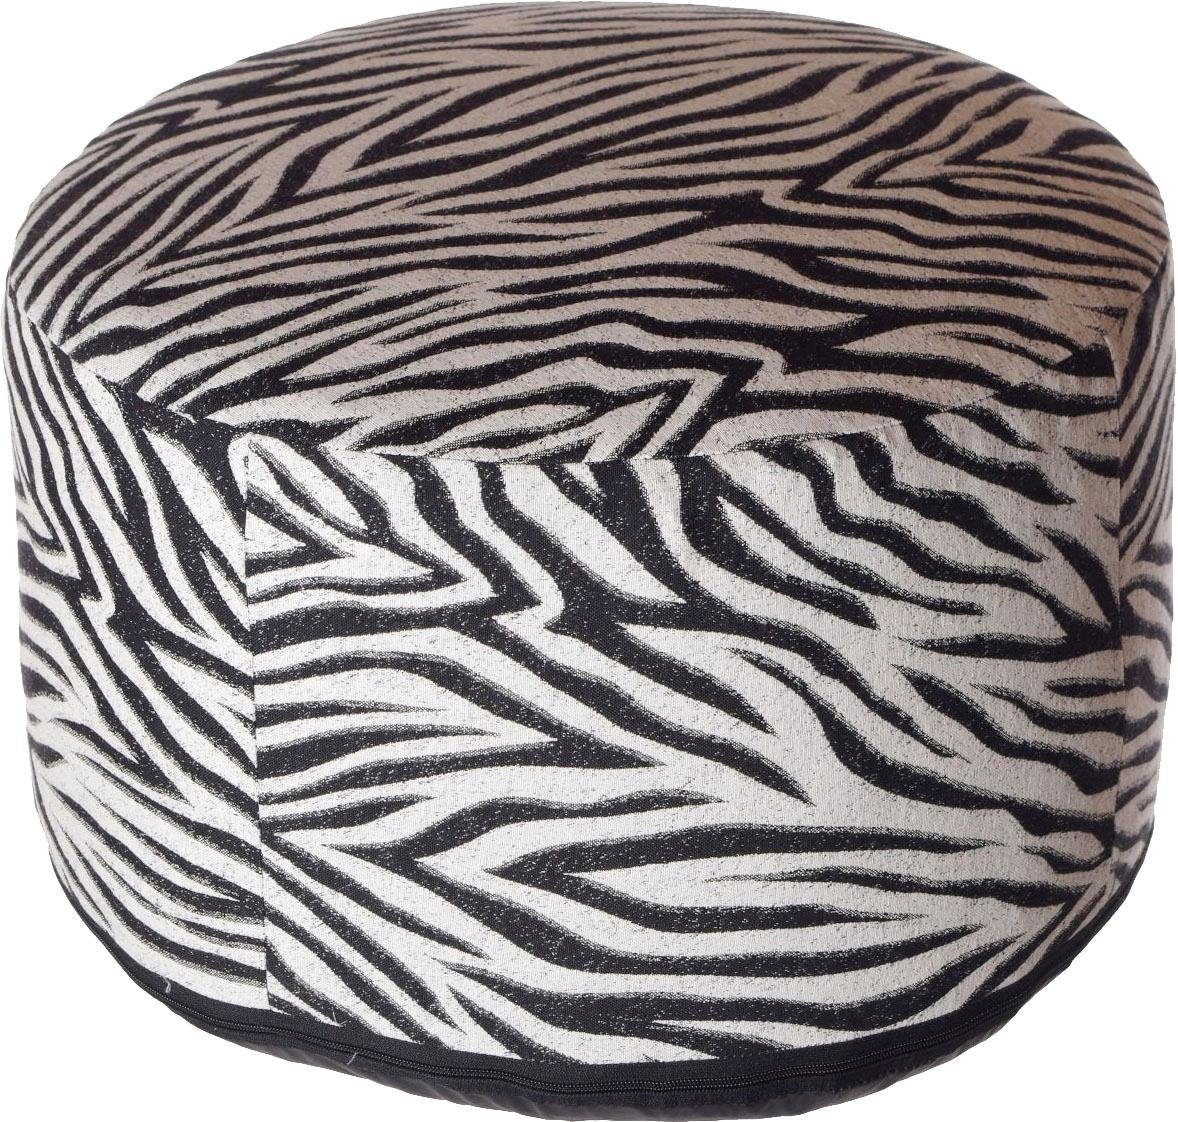 Home affaire Sitzkissen »Zebra«, 50/34 cm